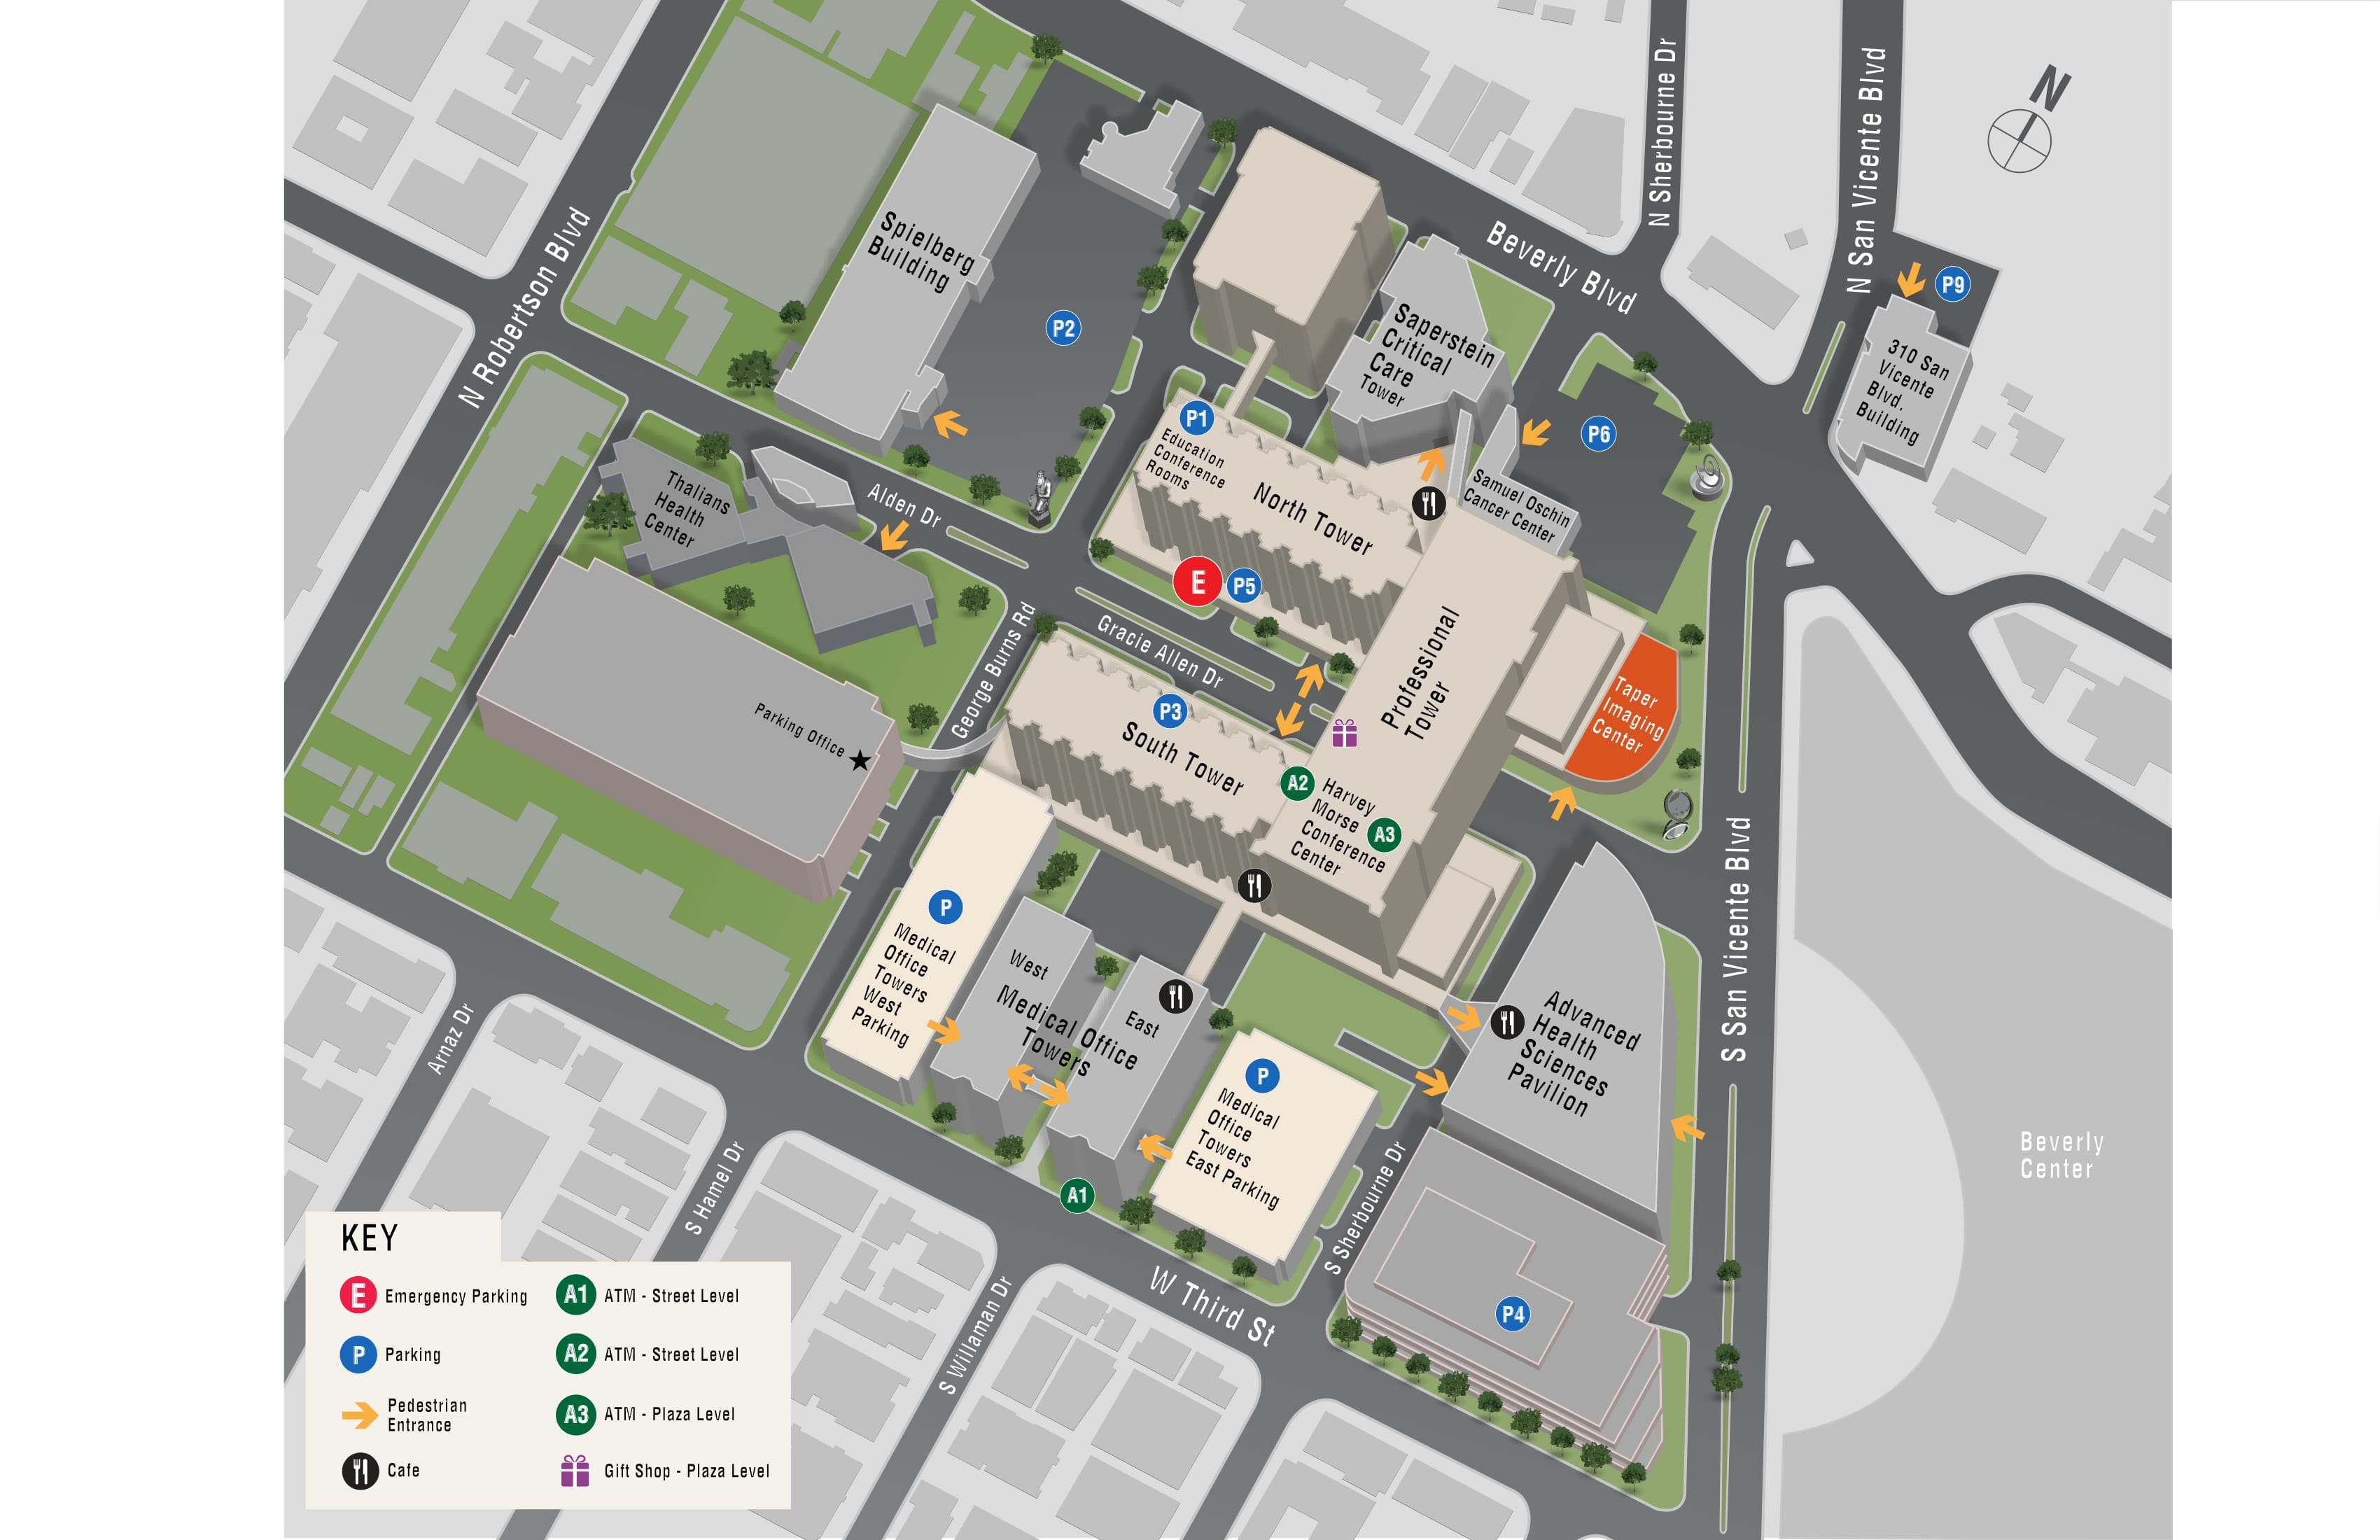 Parking map for S. Mark Taper Foundation Imaging Center